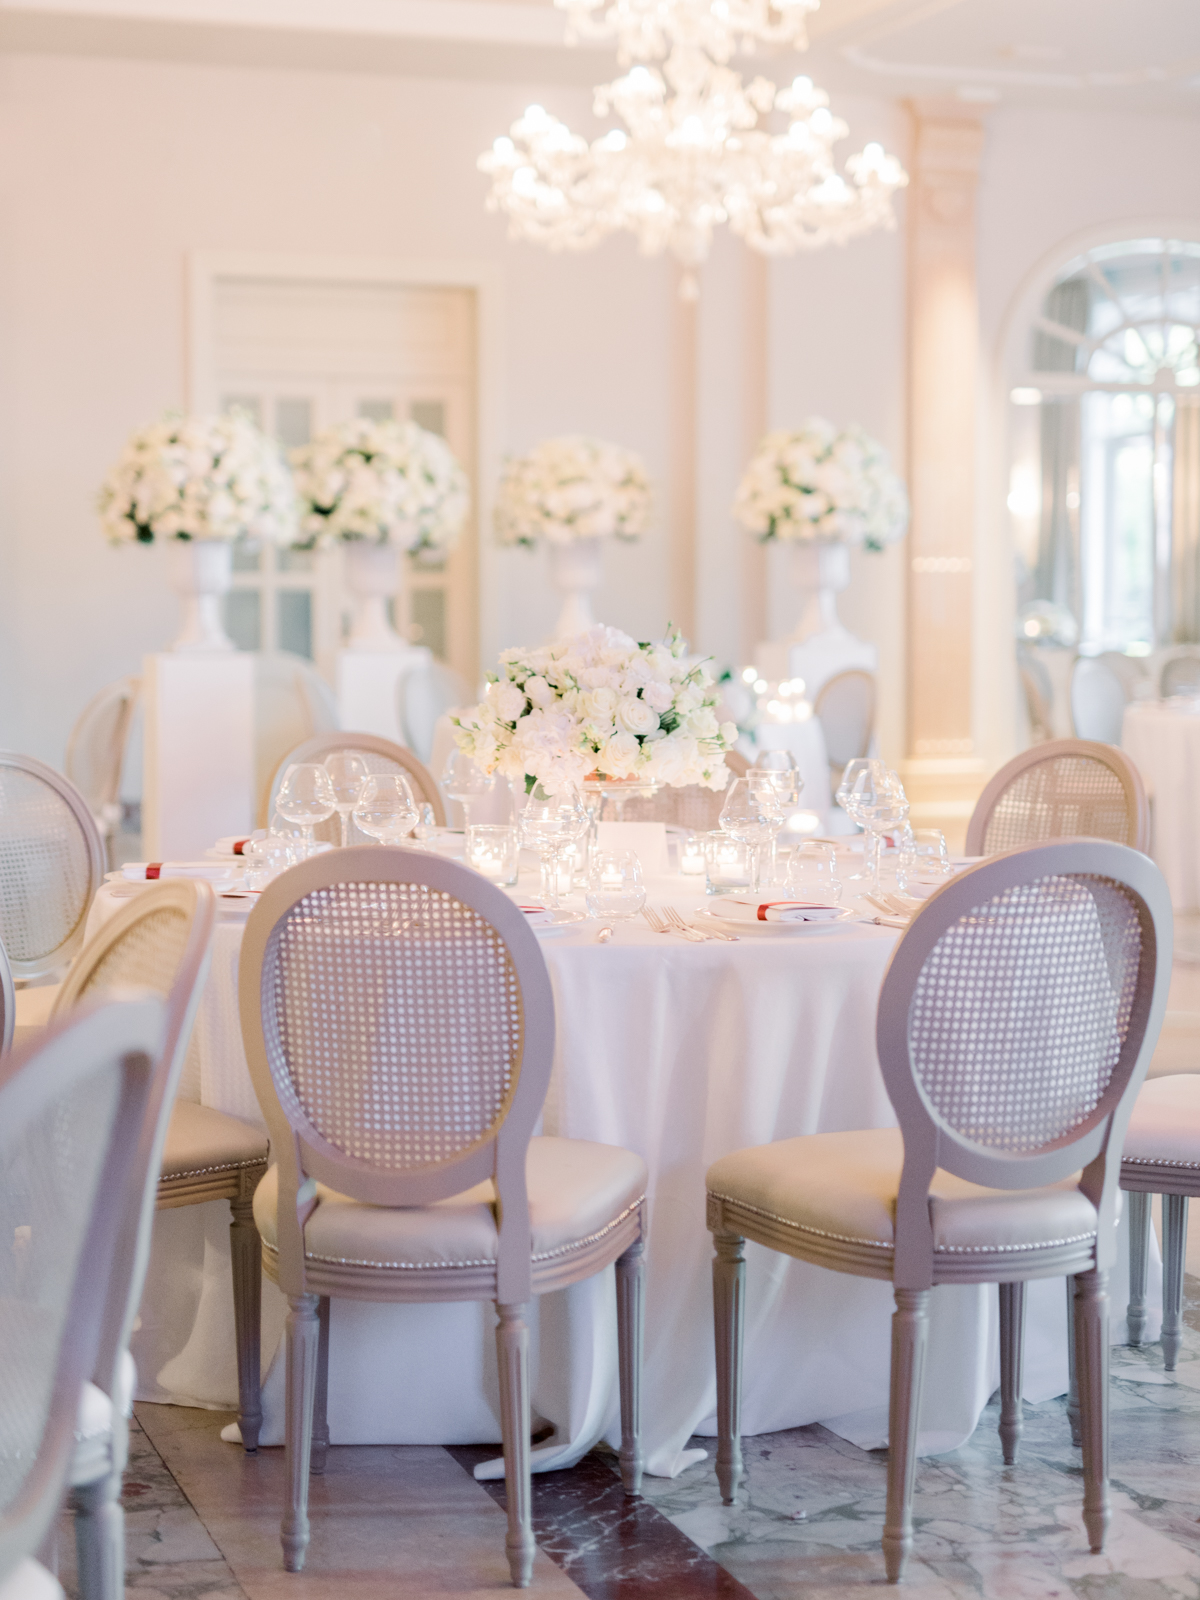 Palace_Villa_Cortine_Hotel_Italian_Wedding_Photographer_Sirmione_AKP-41.jpg